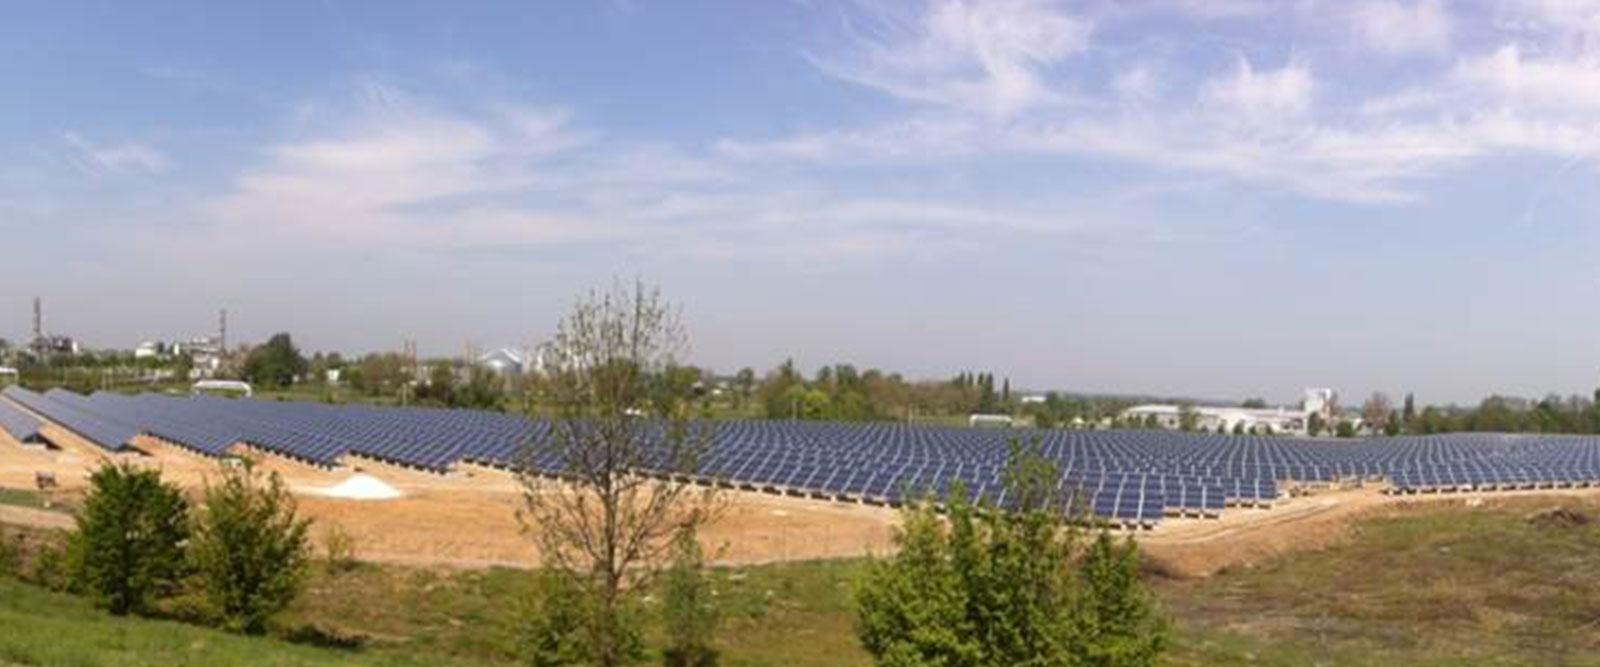 Solarpark_02